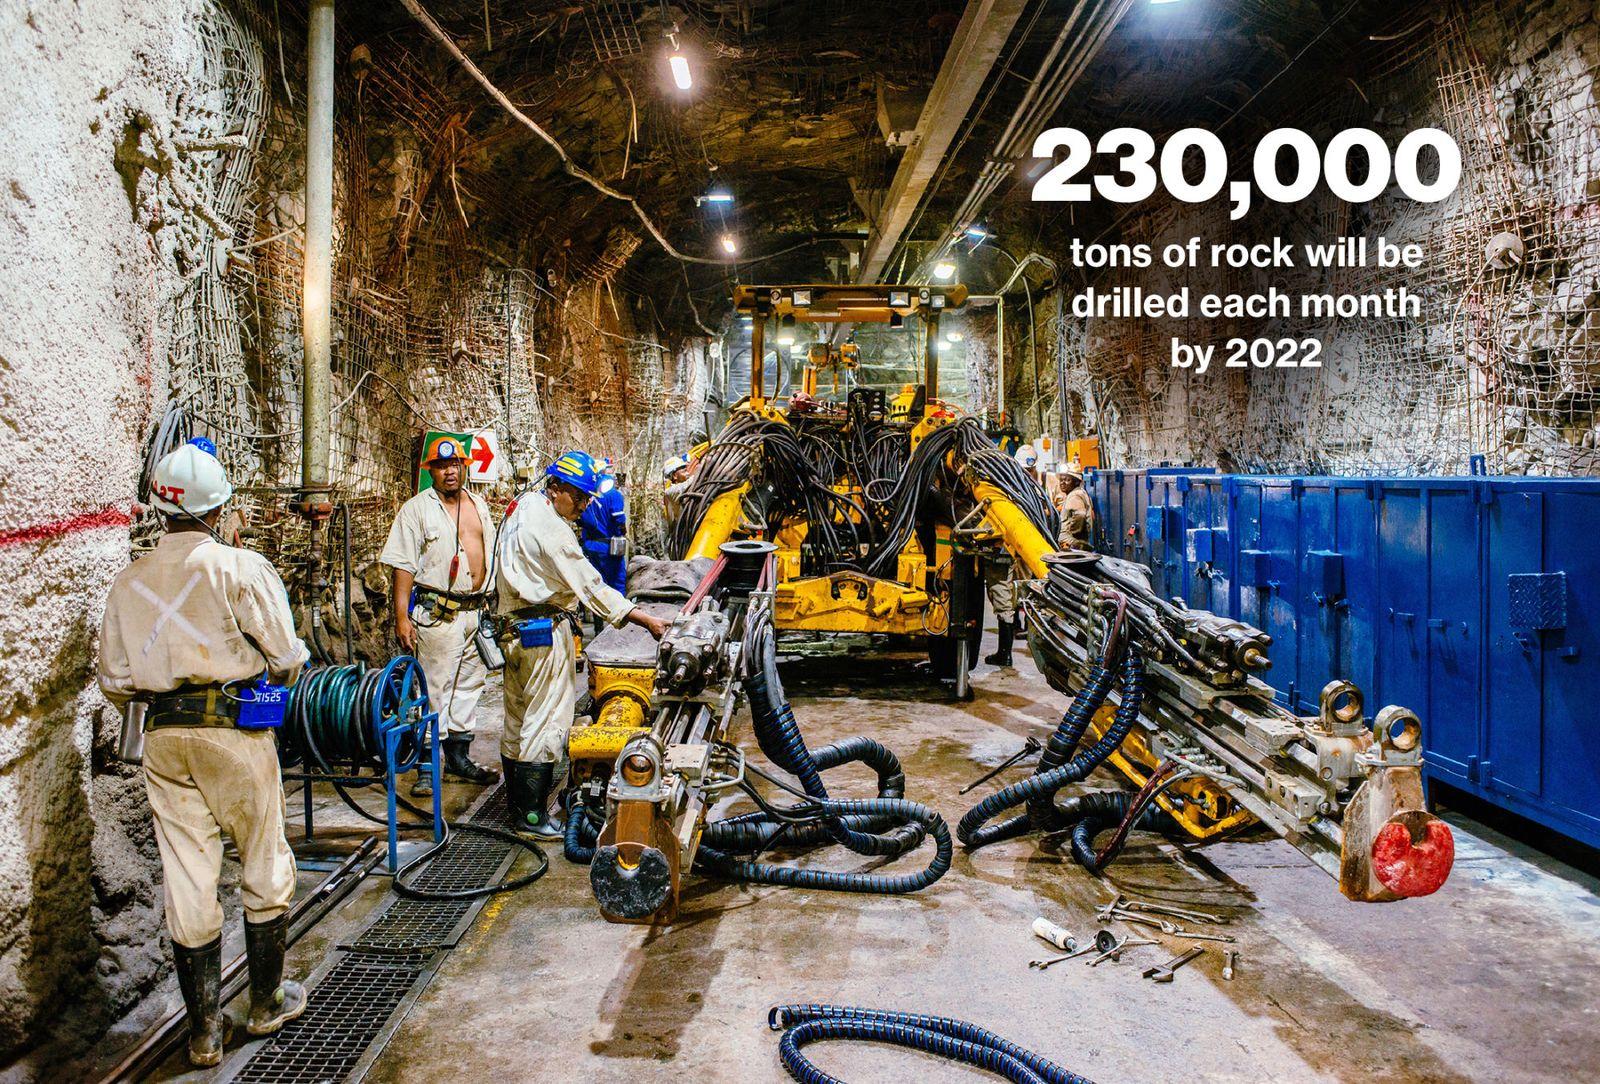 Gold Fields公司專門設計了更大的隧道,機器更容易地在礦井移動。 該公司最近改變了開採方式,使用更大、更有效率的挖掘機來節省成本。